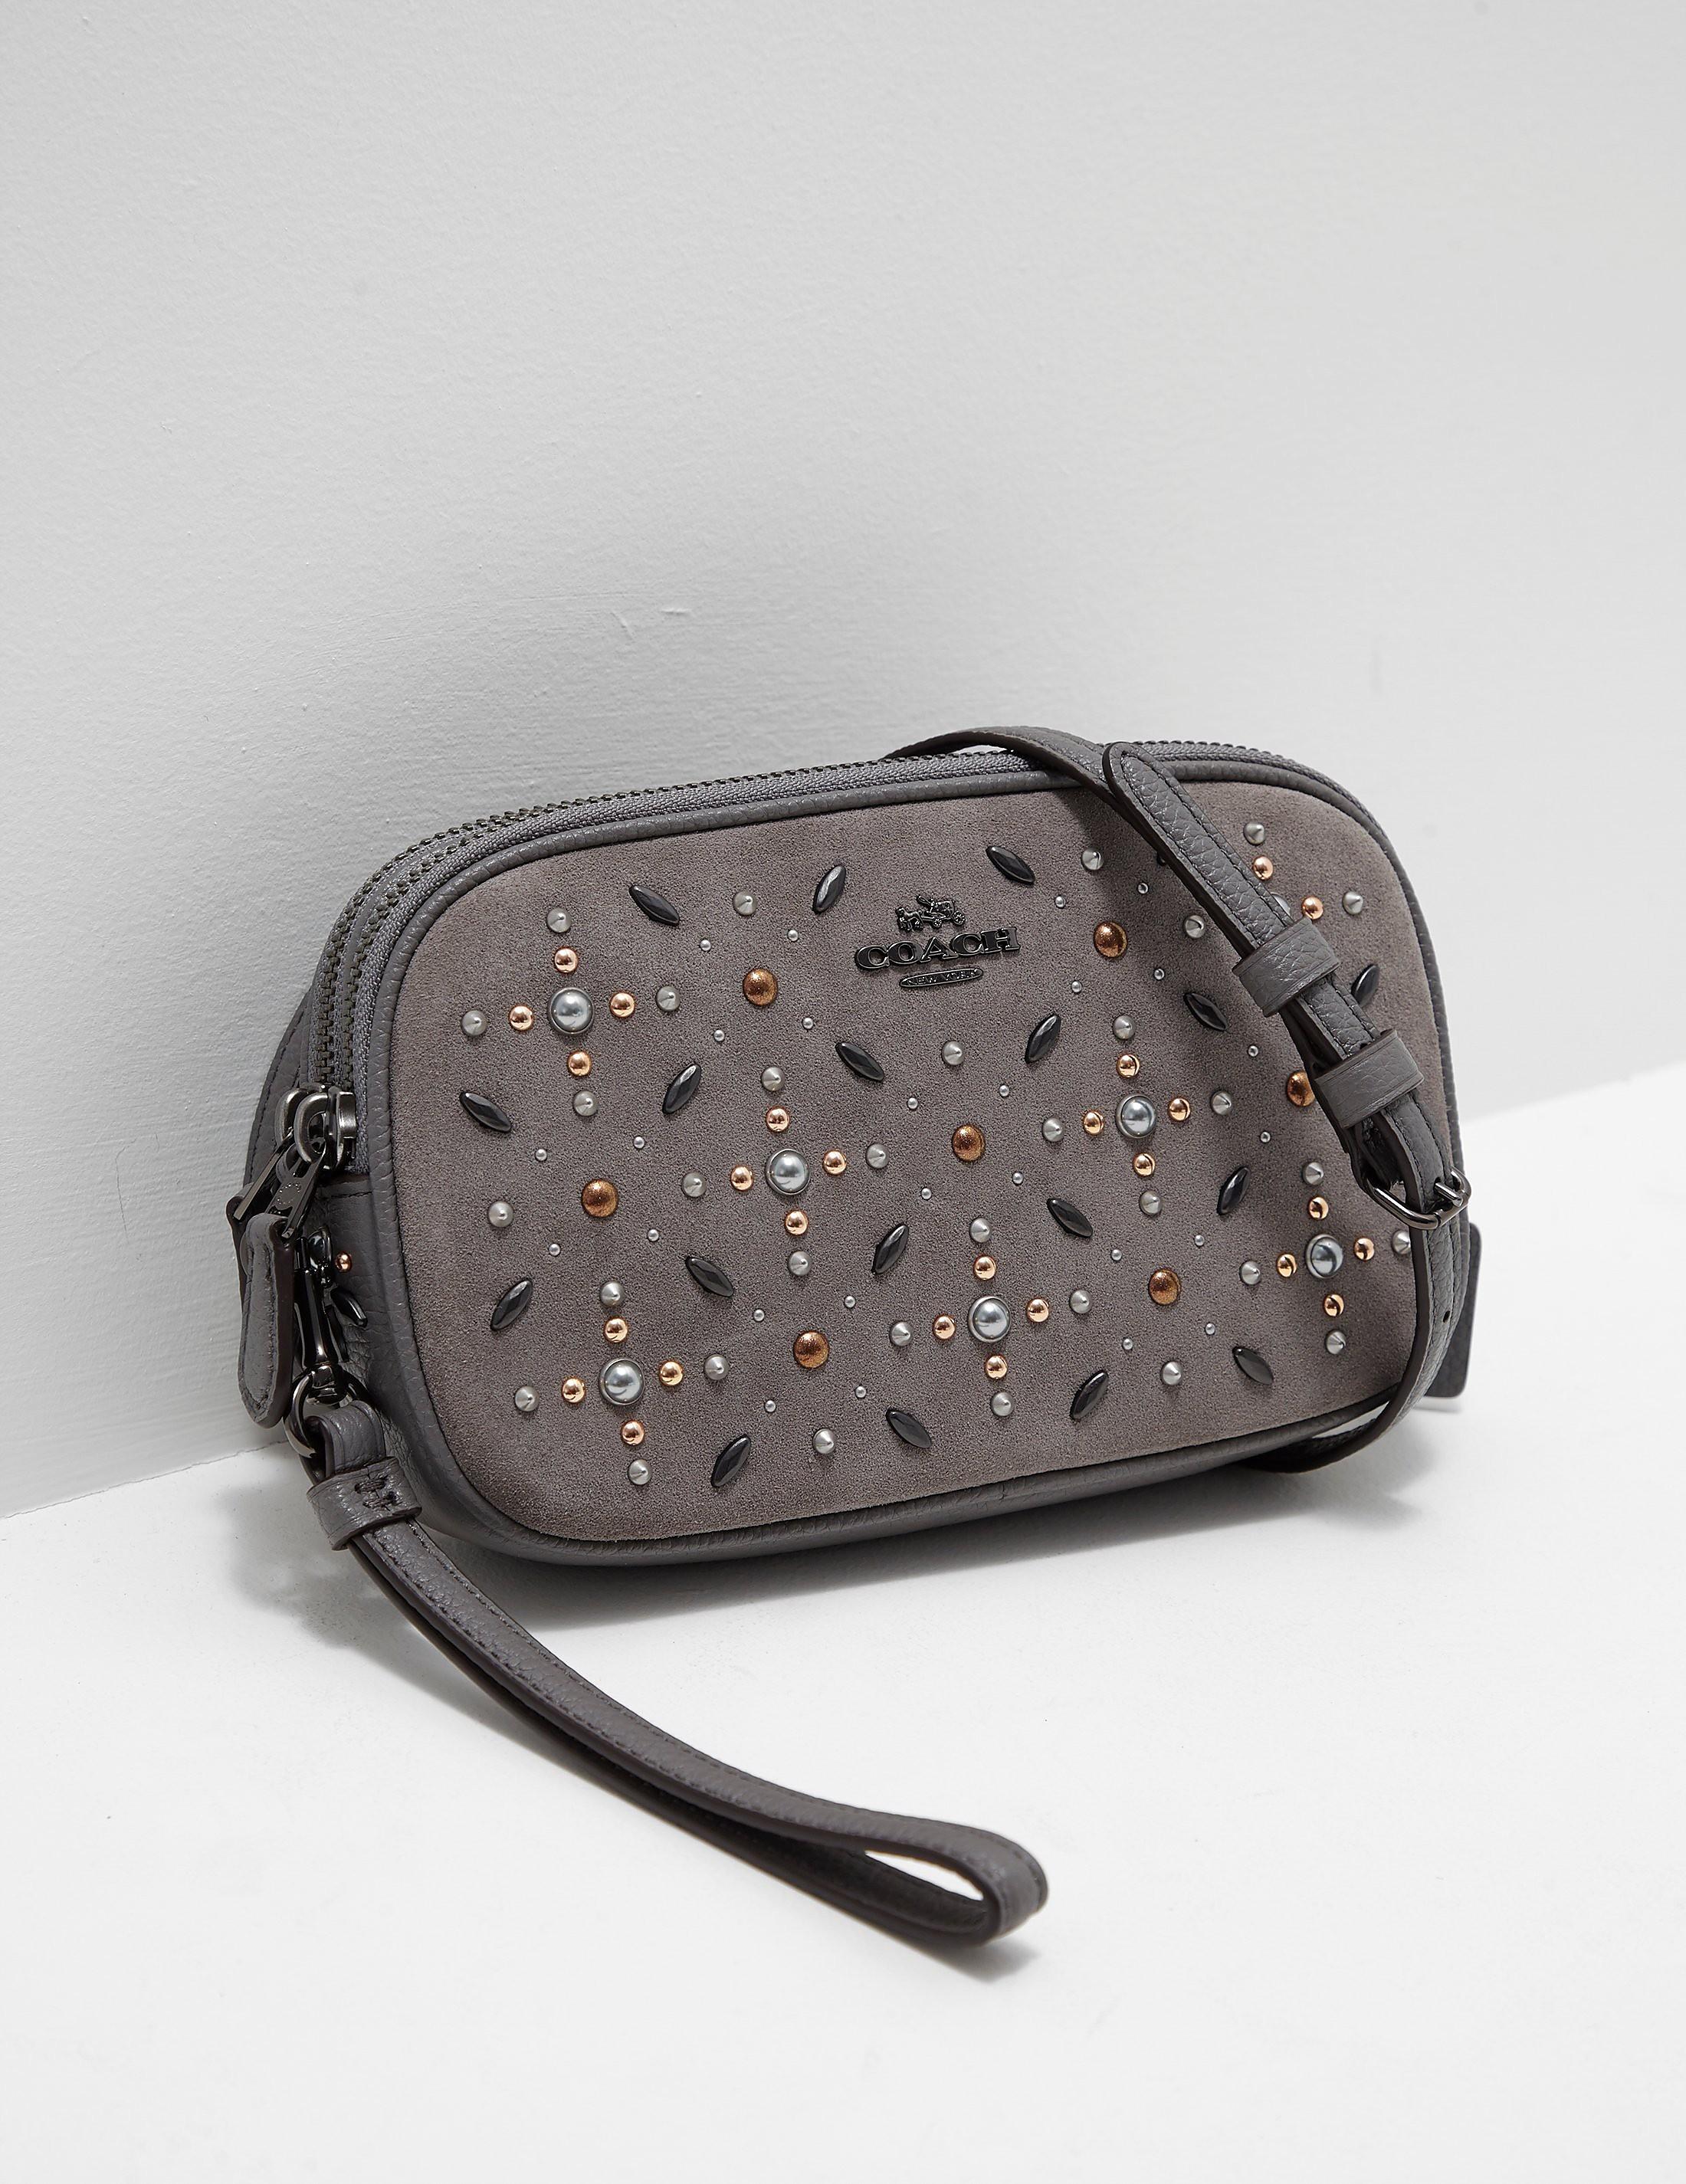 COACH Embellished Crossbody Bag